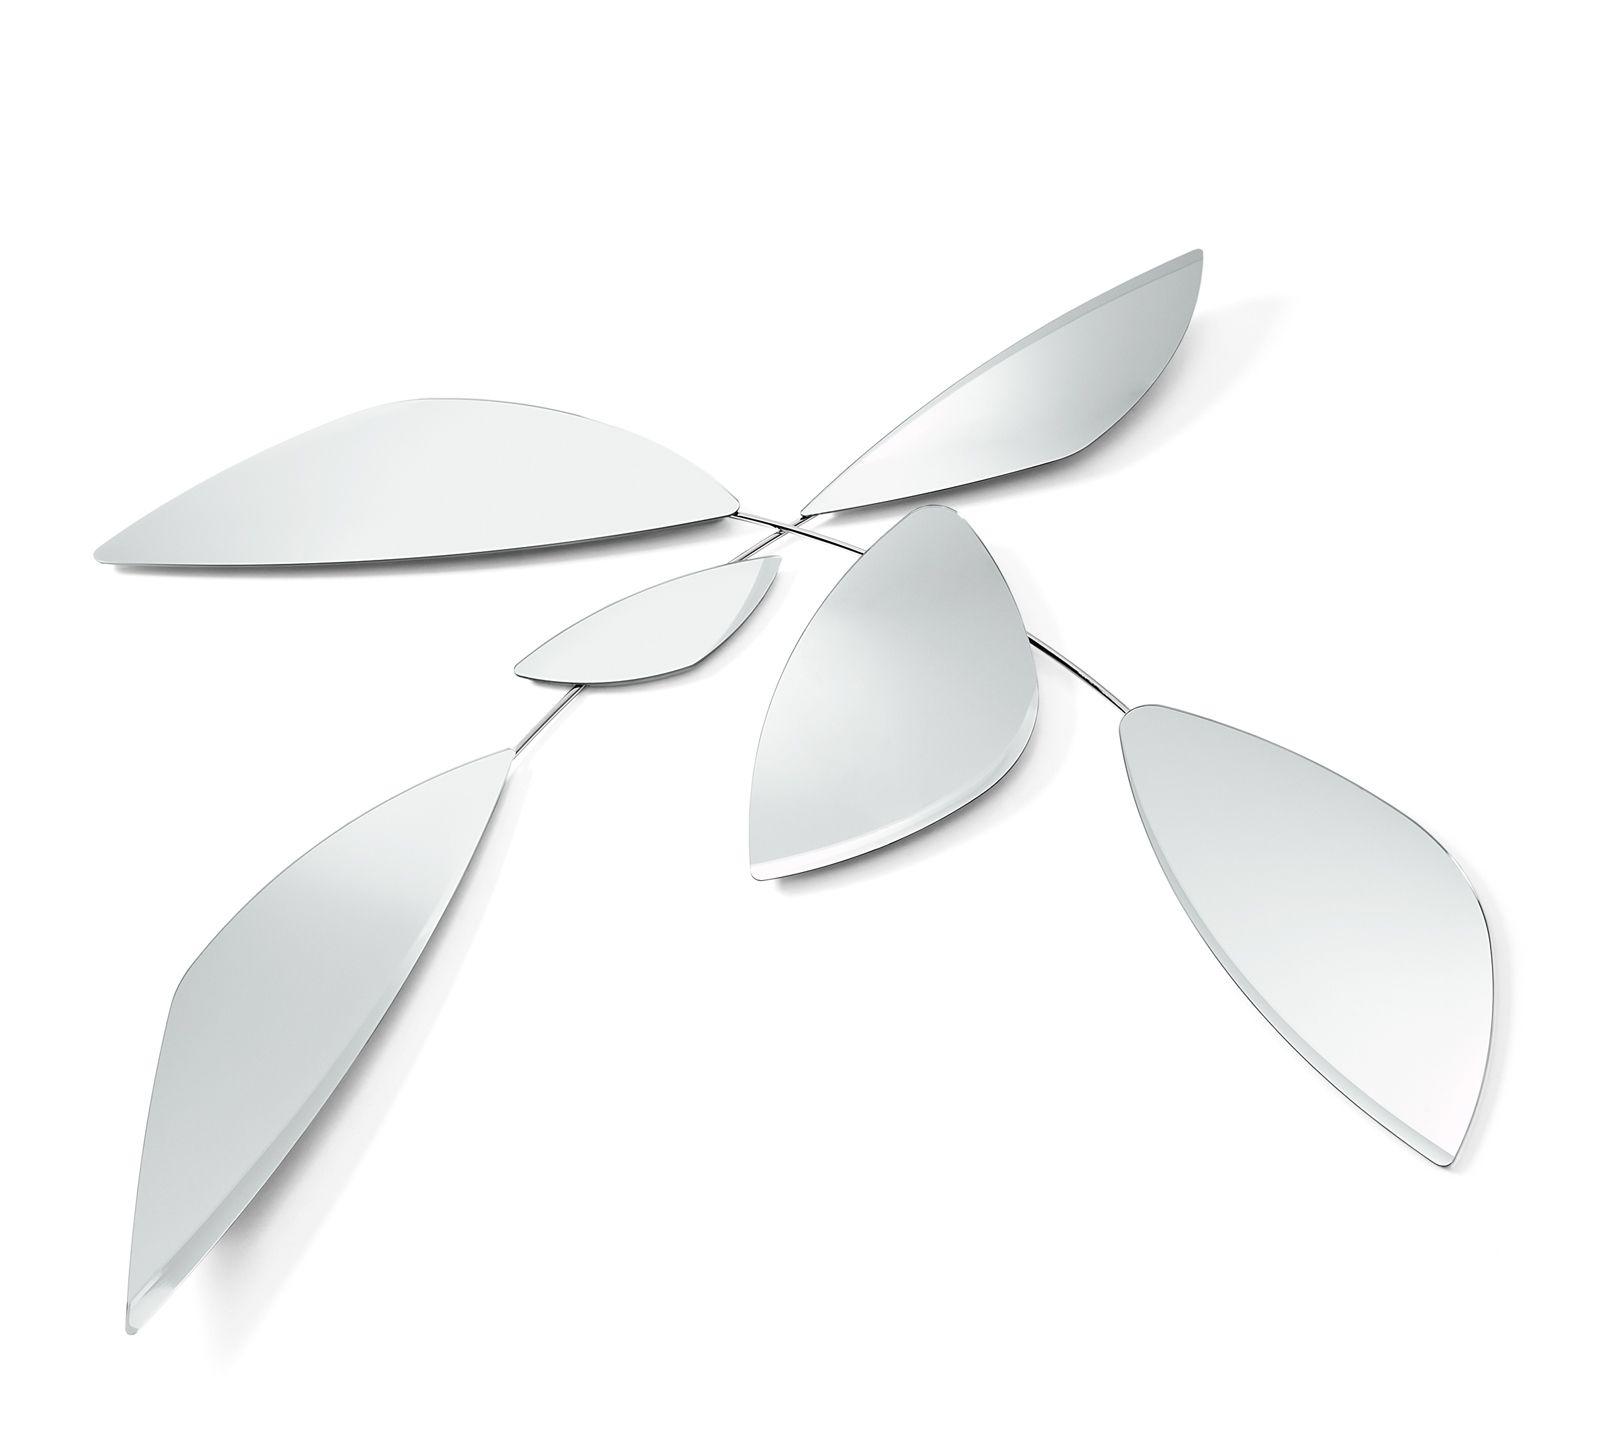 Mirror Leaf by Ricardo Bello Dias  (2012) for Gallotti&Radice